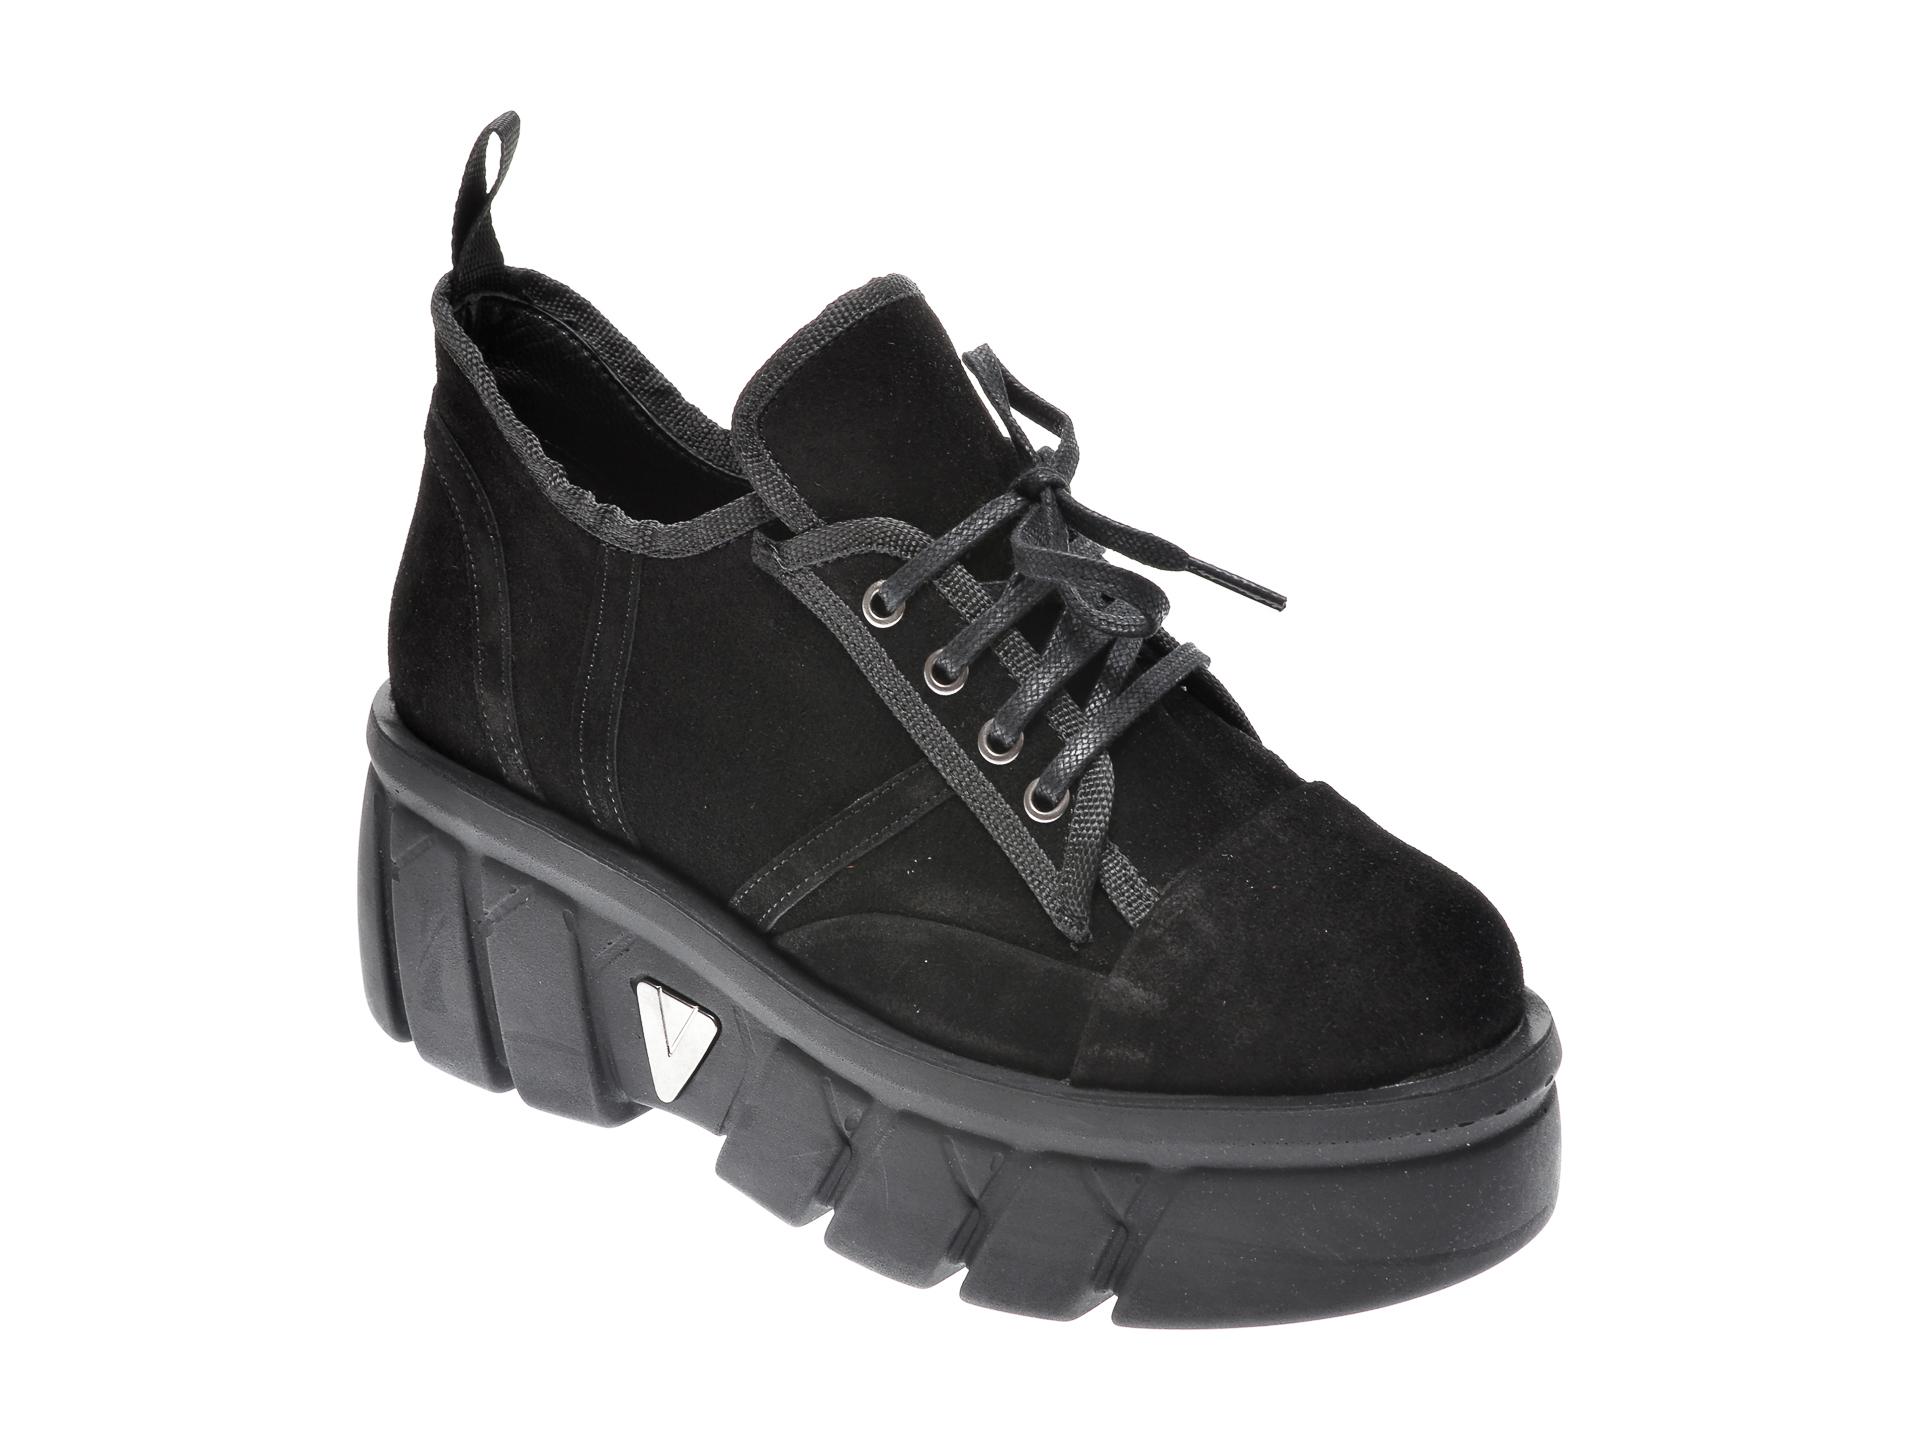 Pantofi Flavia Passini Negri, Z8552, Din Piele Intoarsa